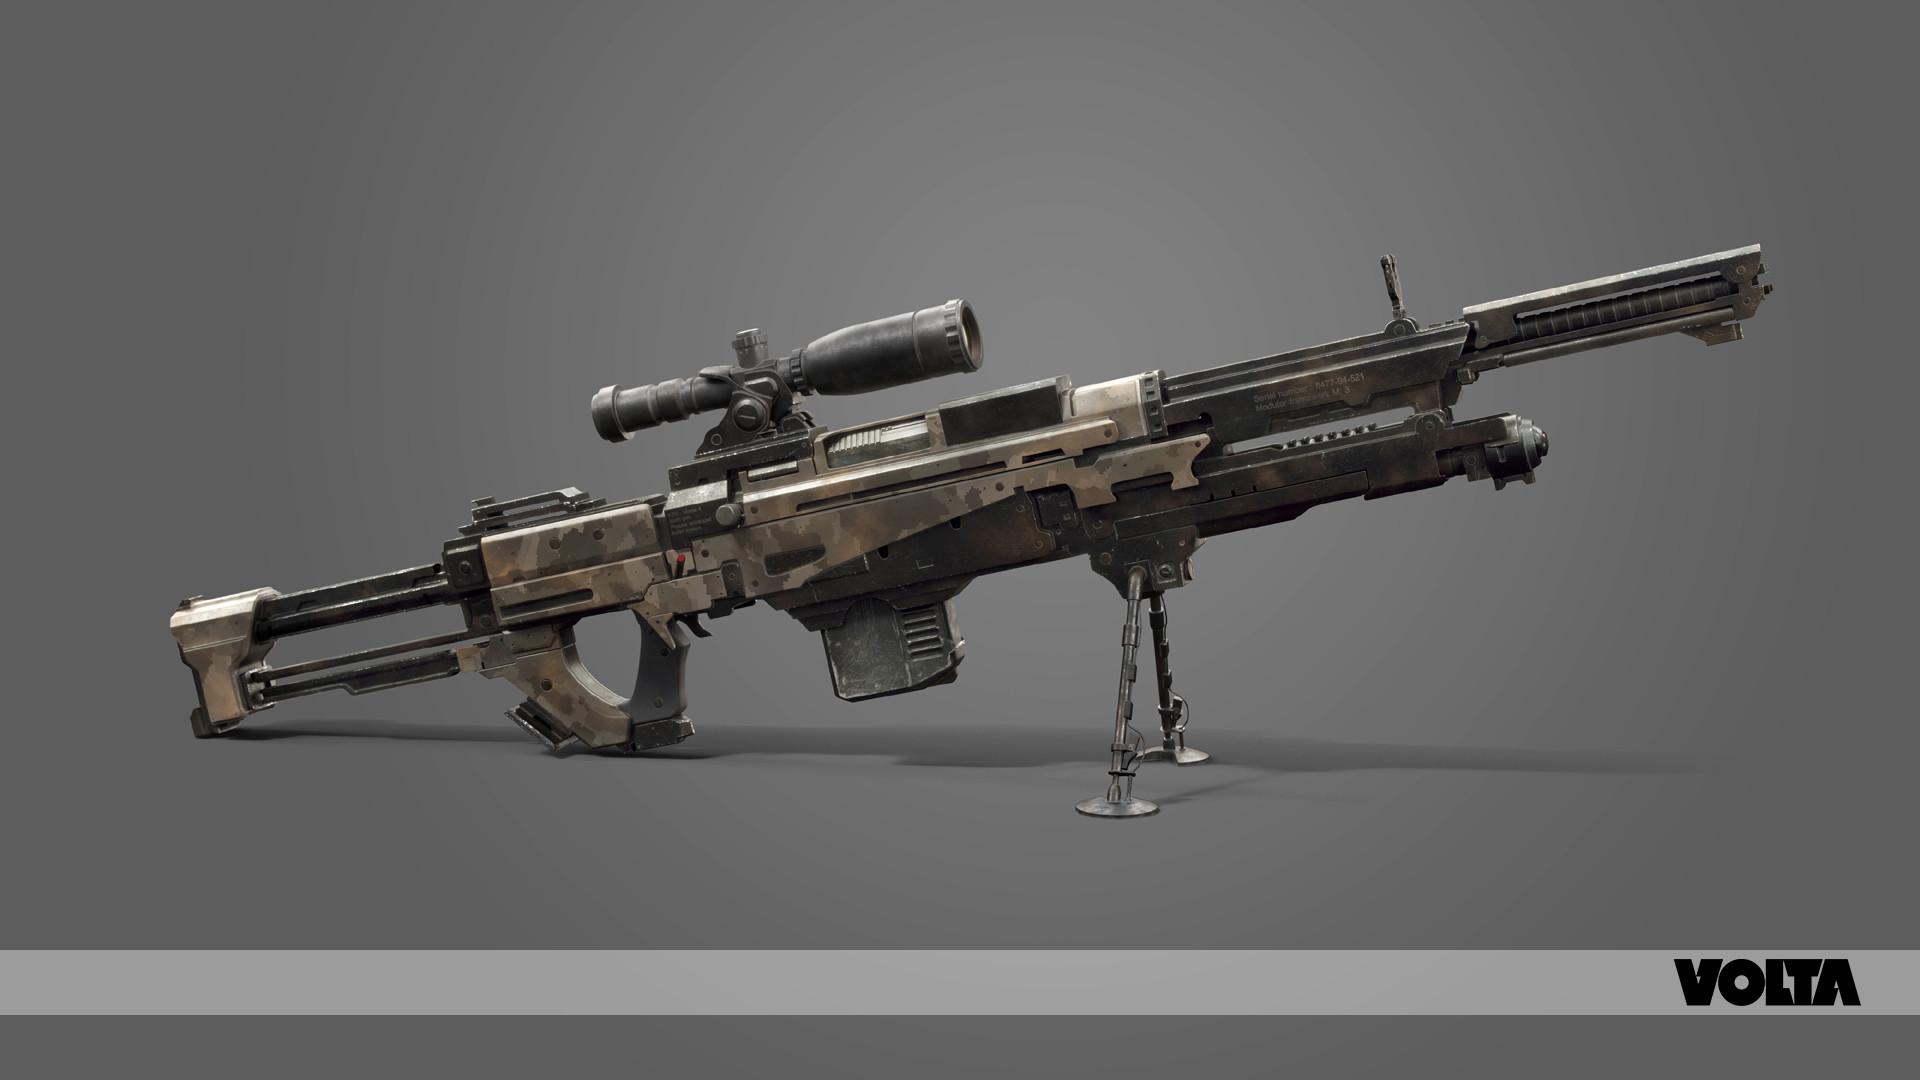 VOLTA_Internal_Weapon.jpg